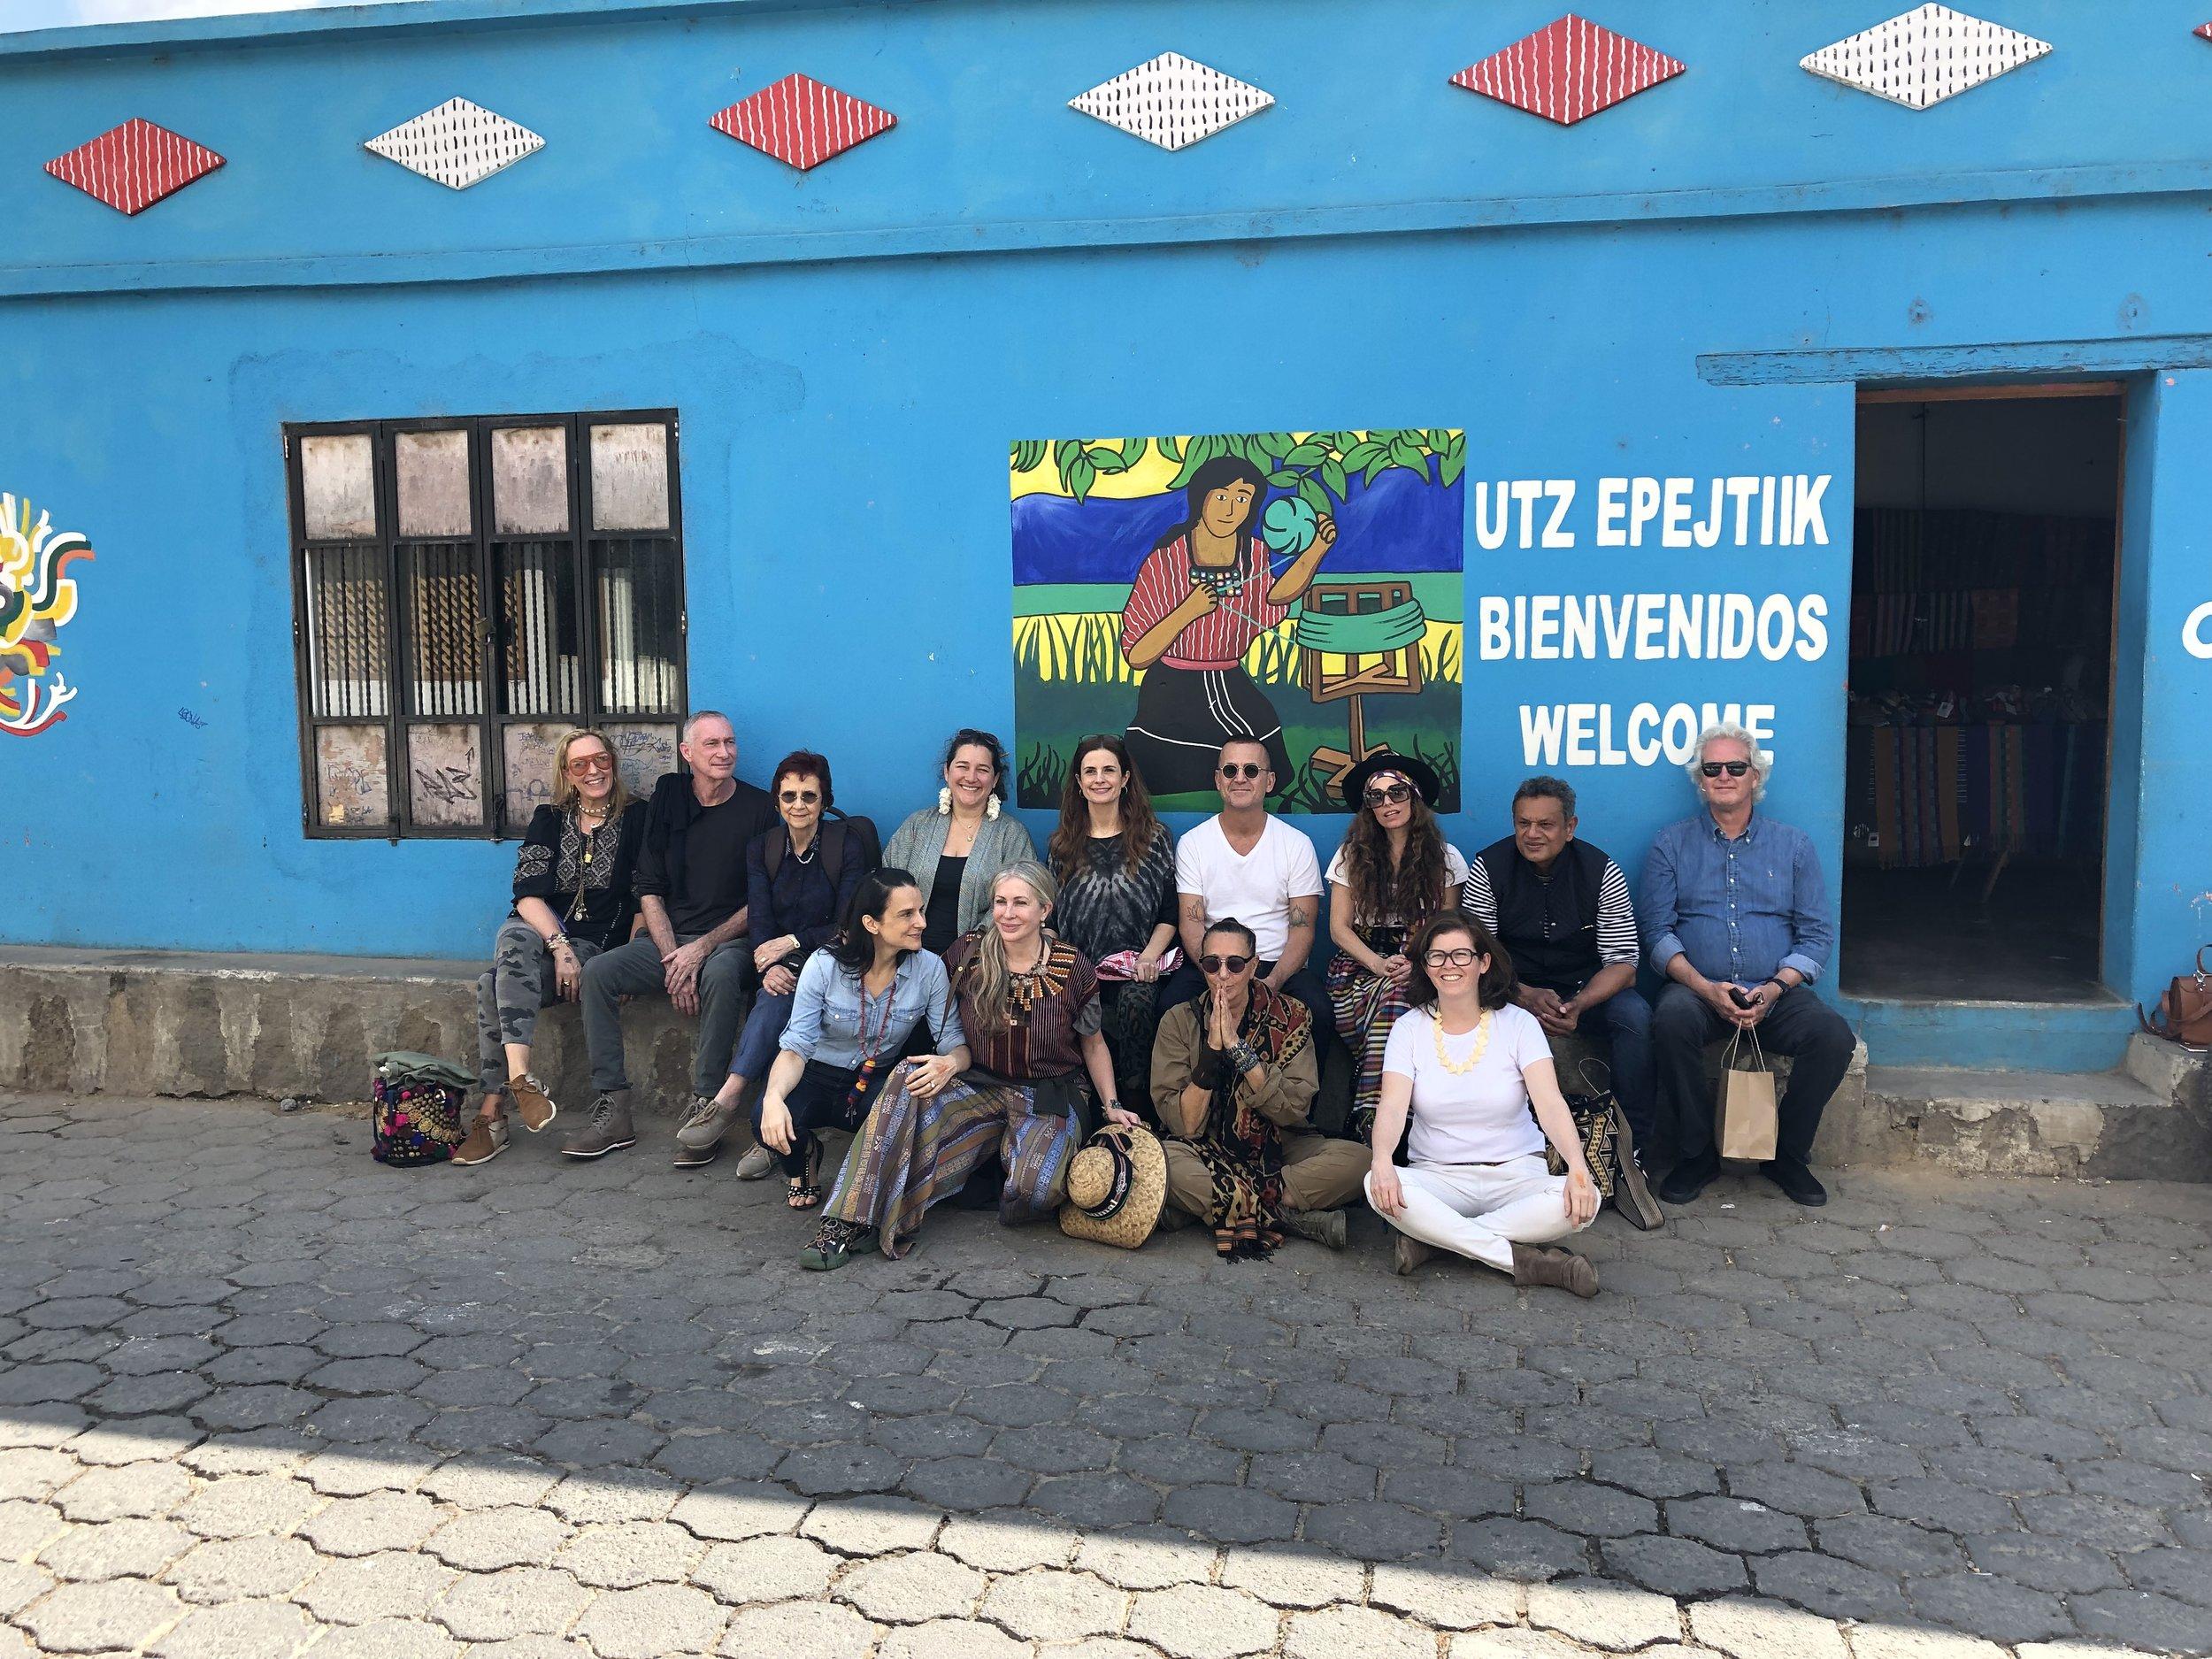 Our first day in Guatemala, visiting the Utz Epejtiik artisanal cooperative with Stephanie von Watzdorf, John Skipper, Celina de Sola, Livia Firth, Steven Kolb, Carolina Kleinman, Marianne Hernandez, Donna Karan.